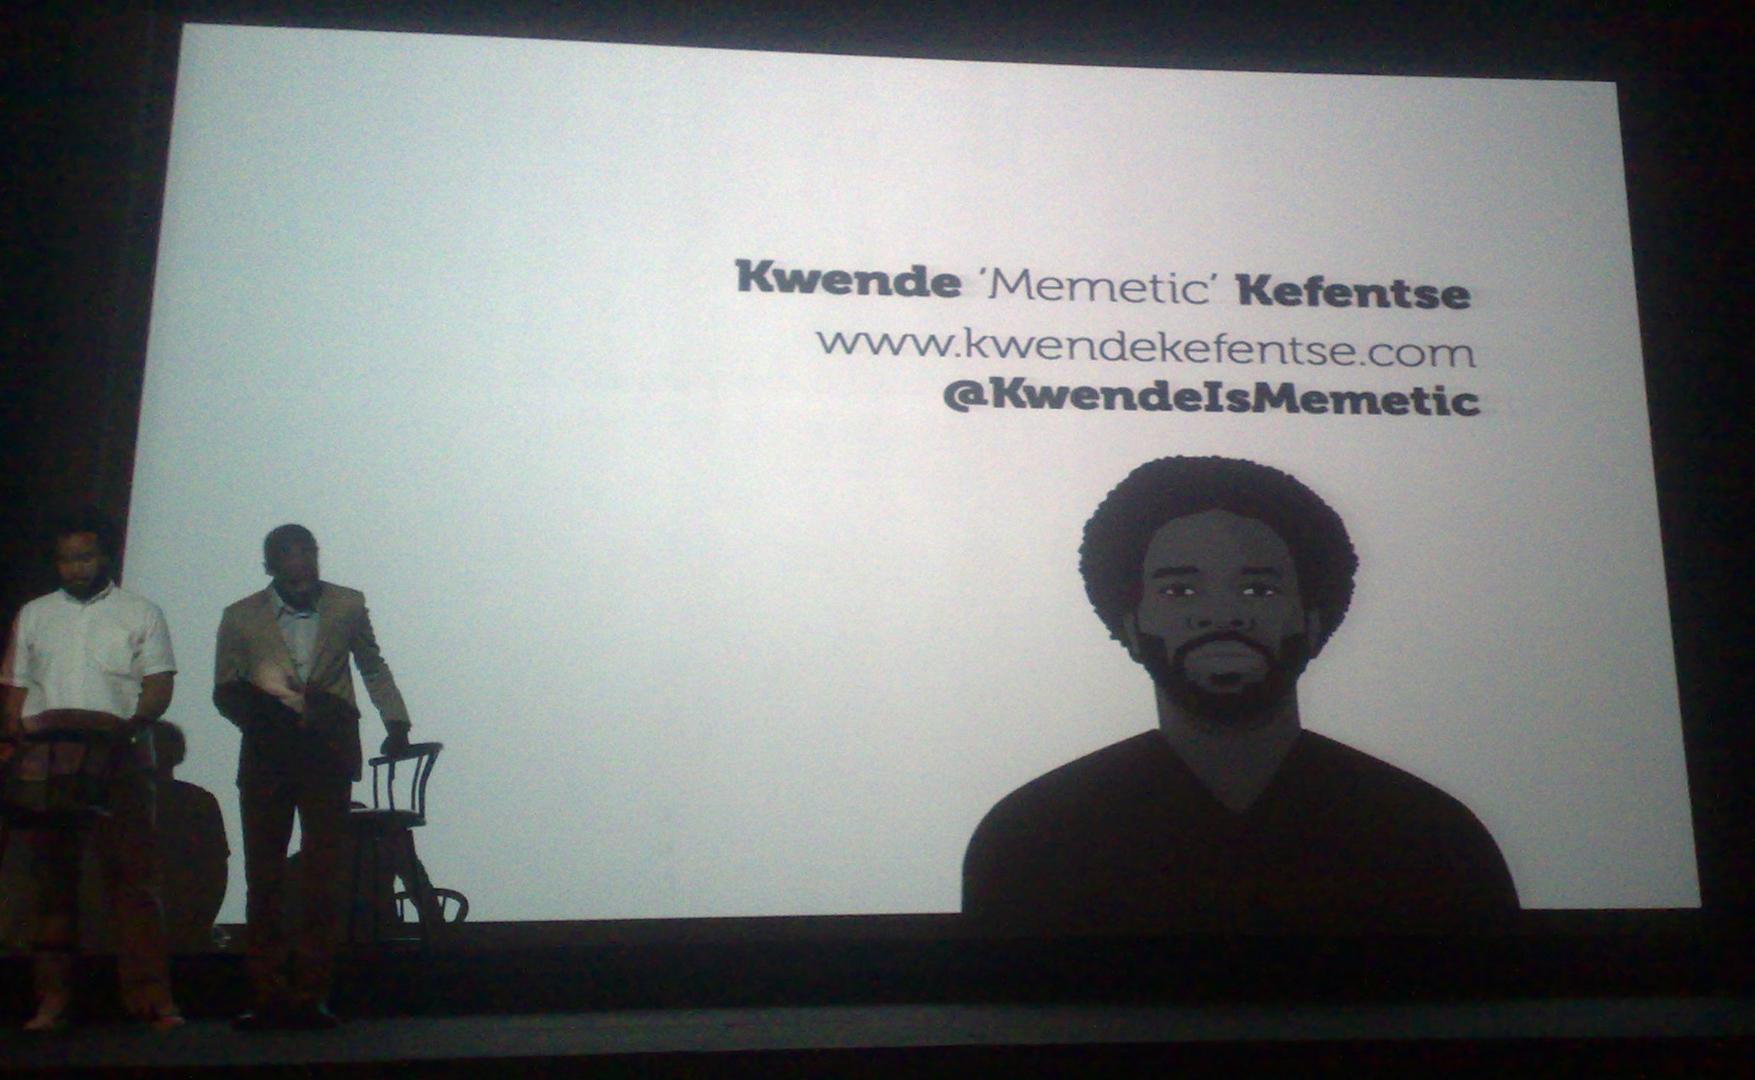 ©, Kwende Kefentse, DJ Memetric